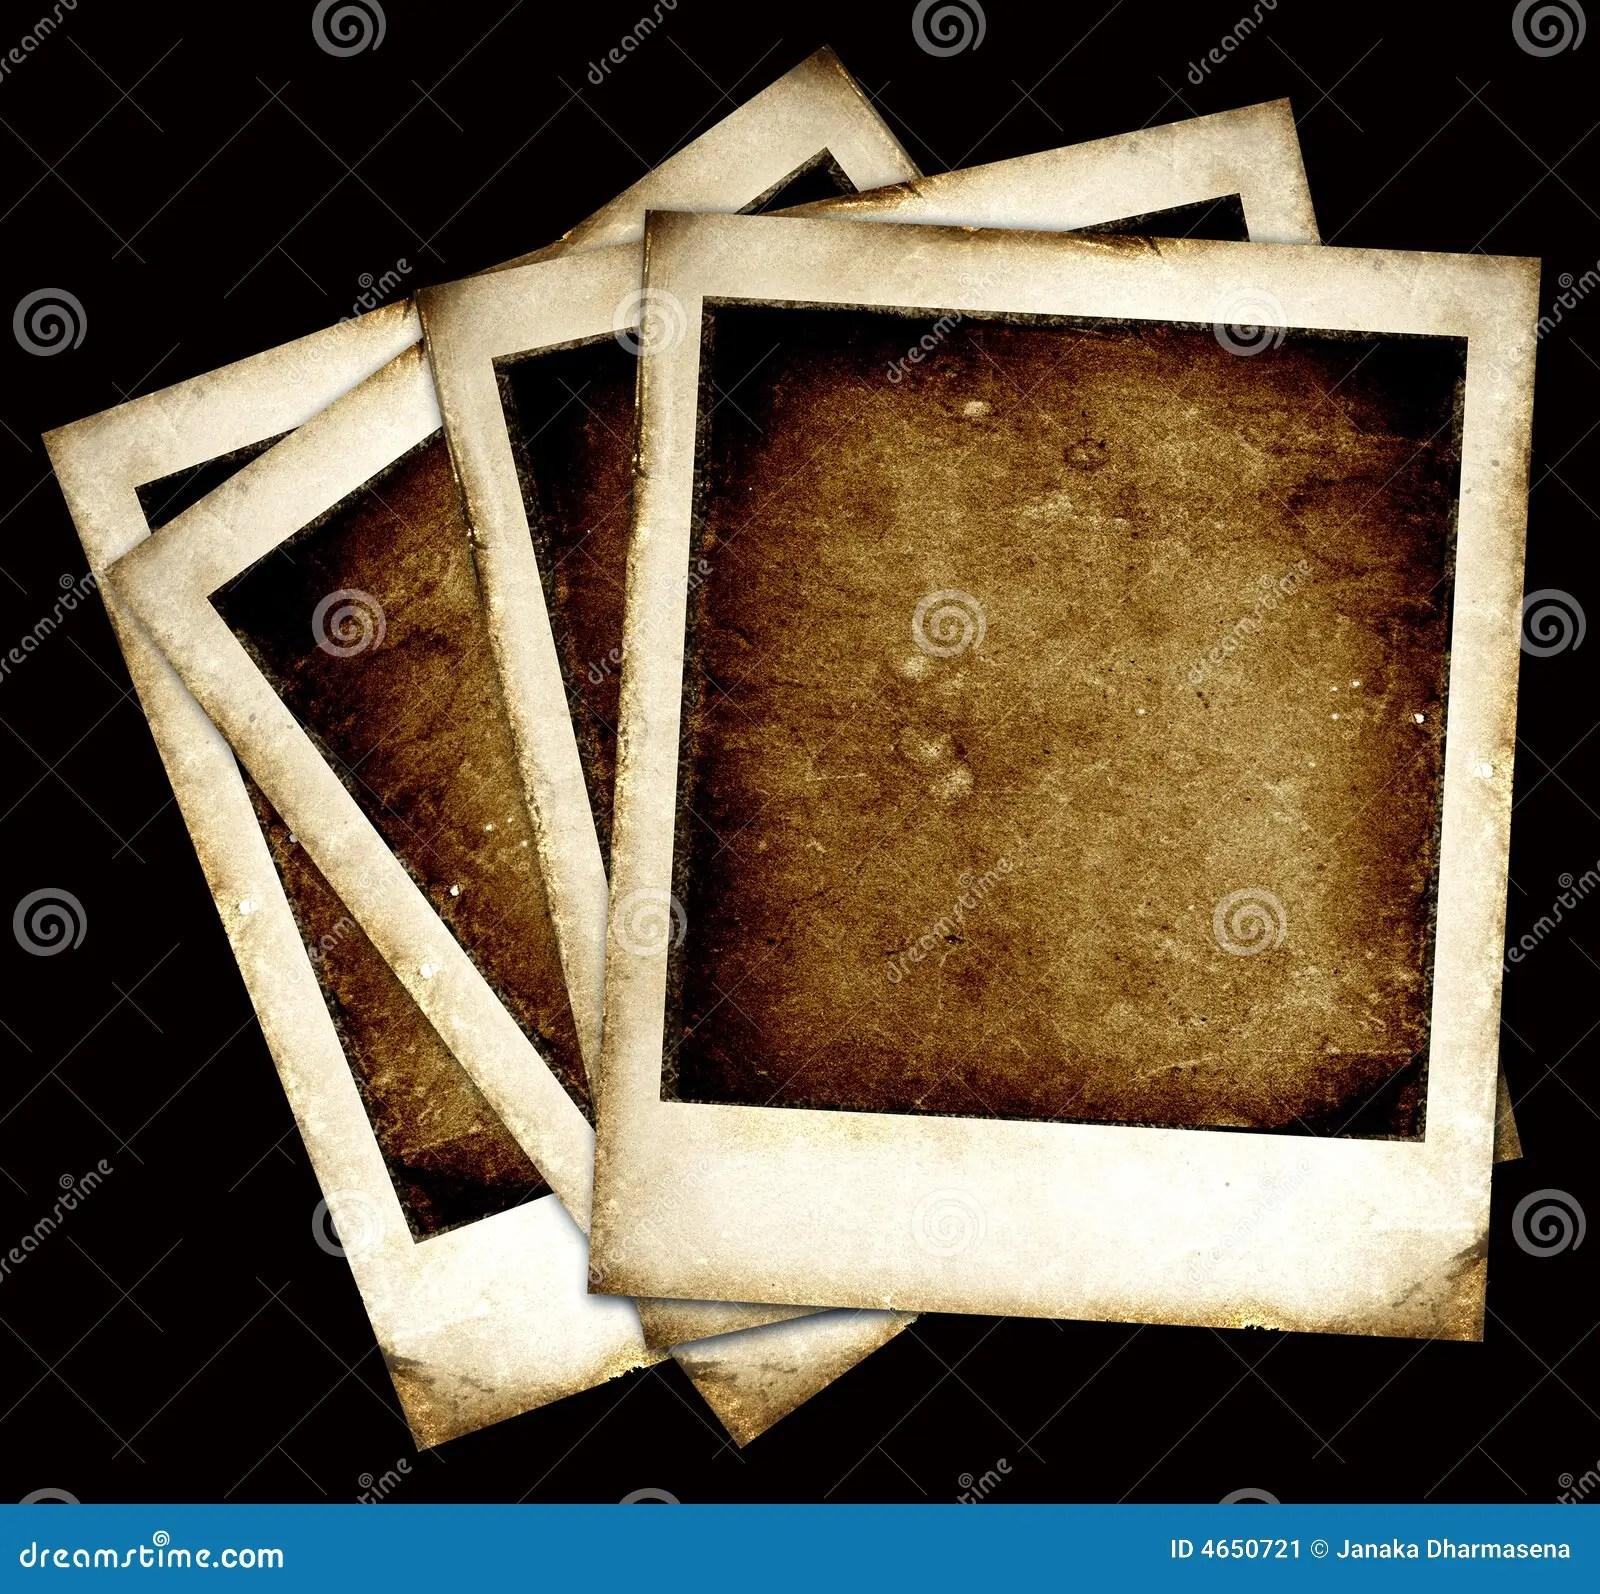 Vintage Polaroid Frames Stock Image  Image 4650721